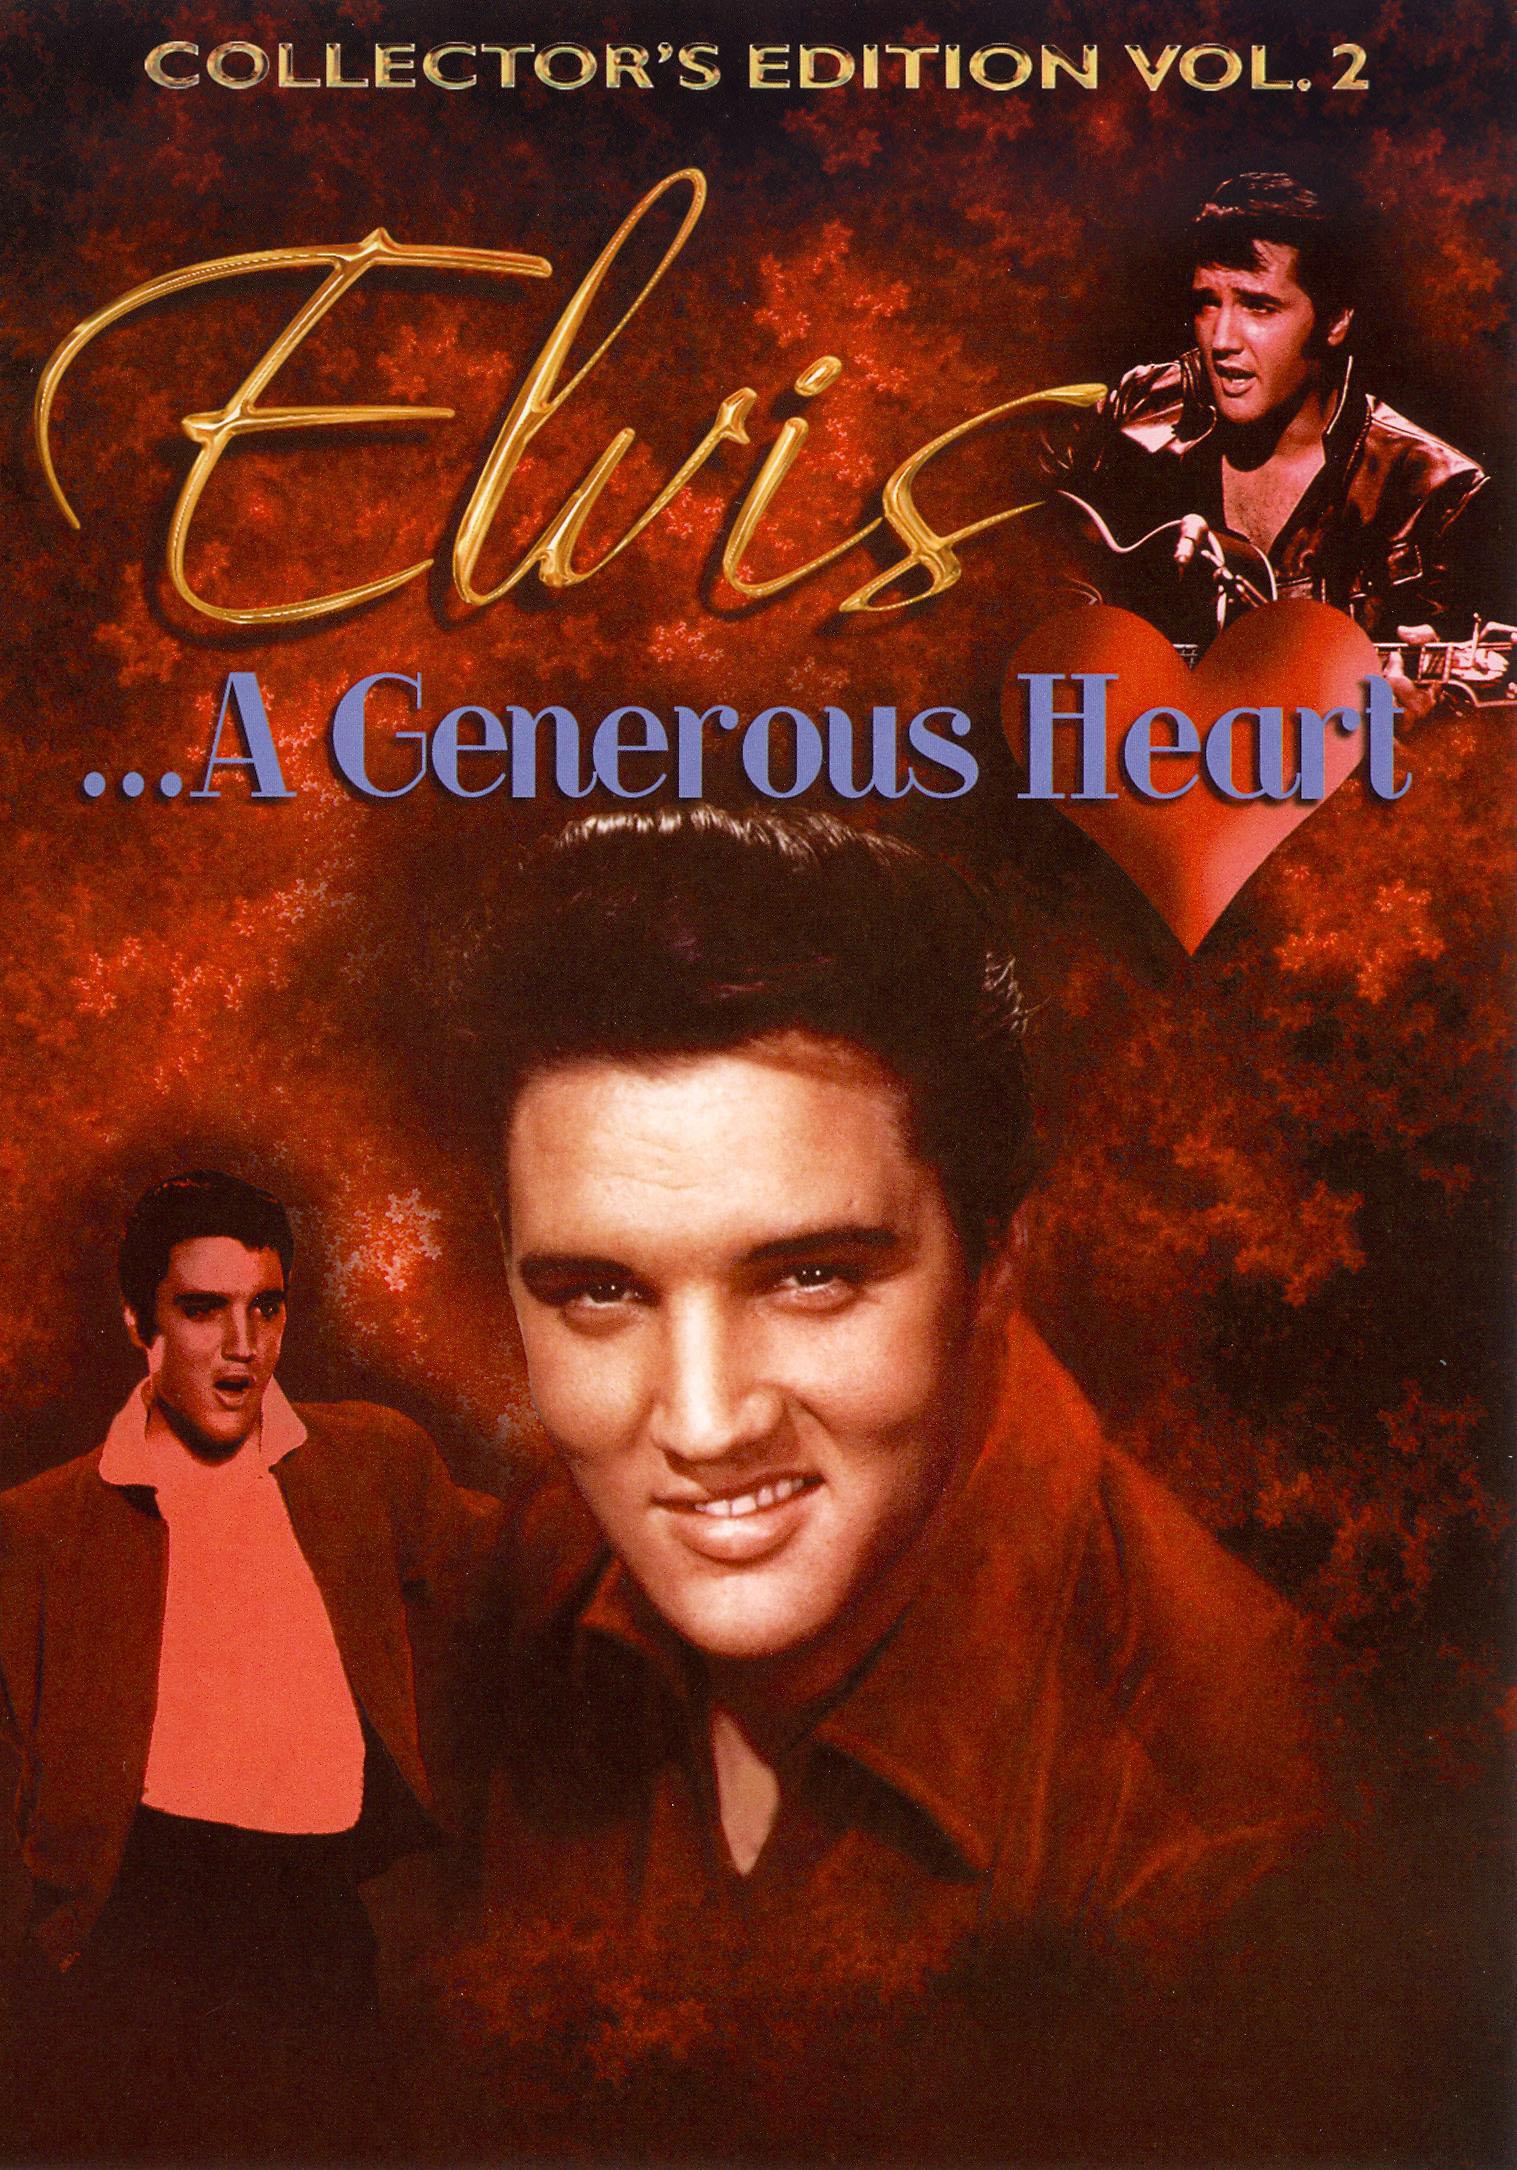 Elvis... A Generous Heart, Vol. 2